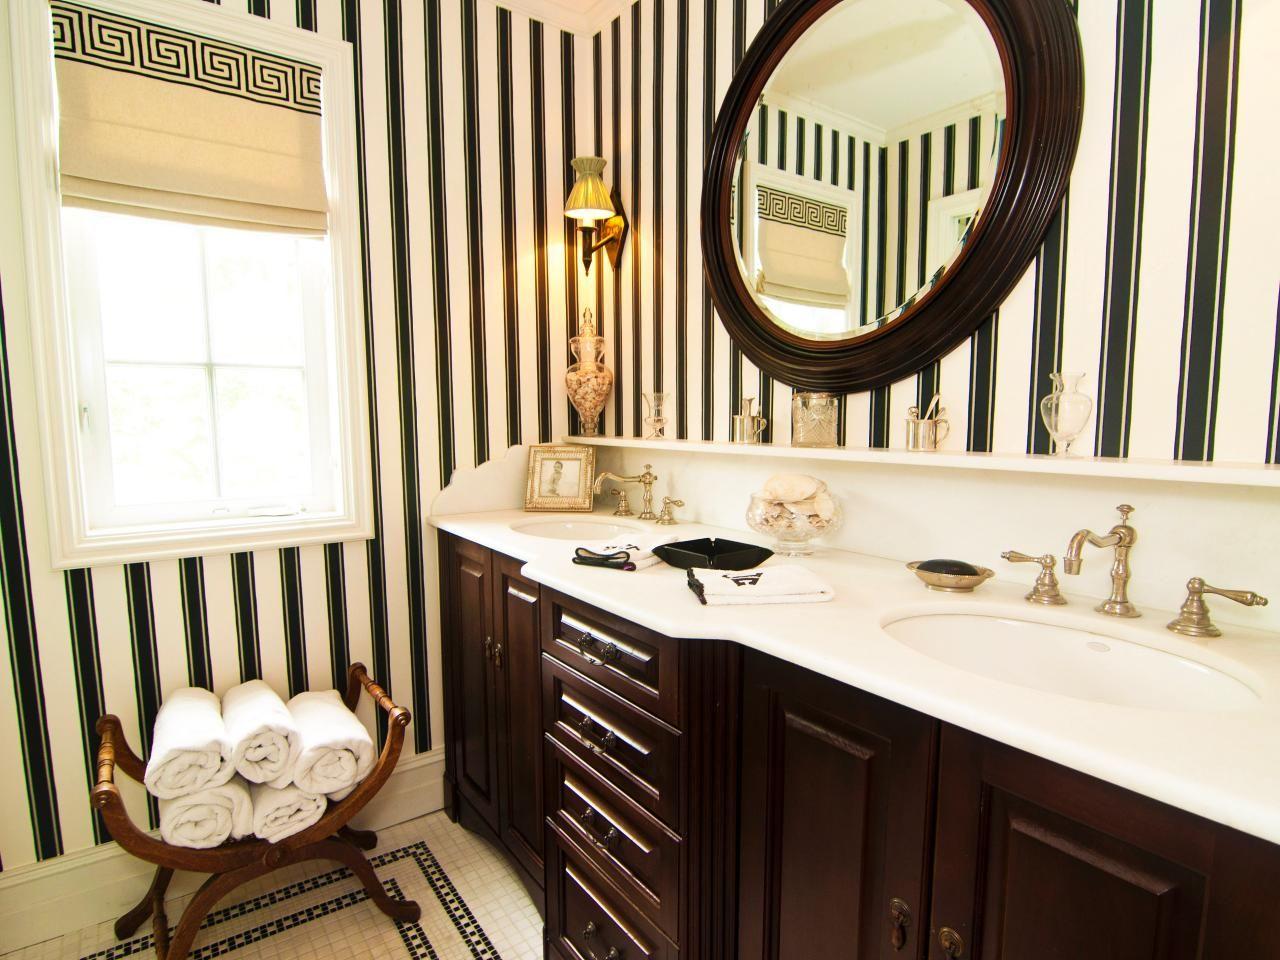 Tuscan Bathroom Design Ideas: HGTV Pictures & Tips | Marble ... on asian inspired bathroom design, vintage inspired bathroom design, hippie bathroom design, safari style bathroom design, houzz bathroom design, camo bathroom design, industrial chic bathroom design,